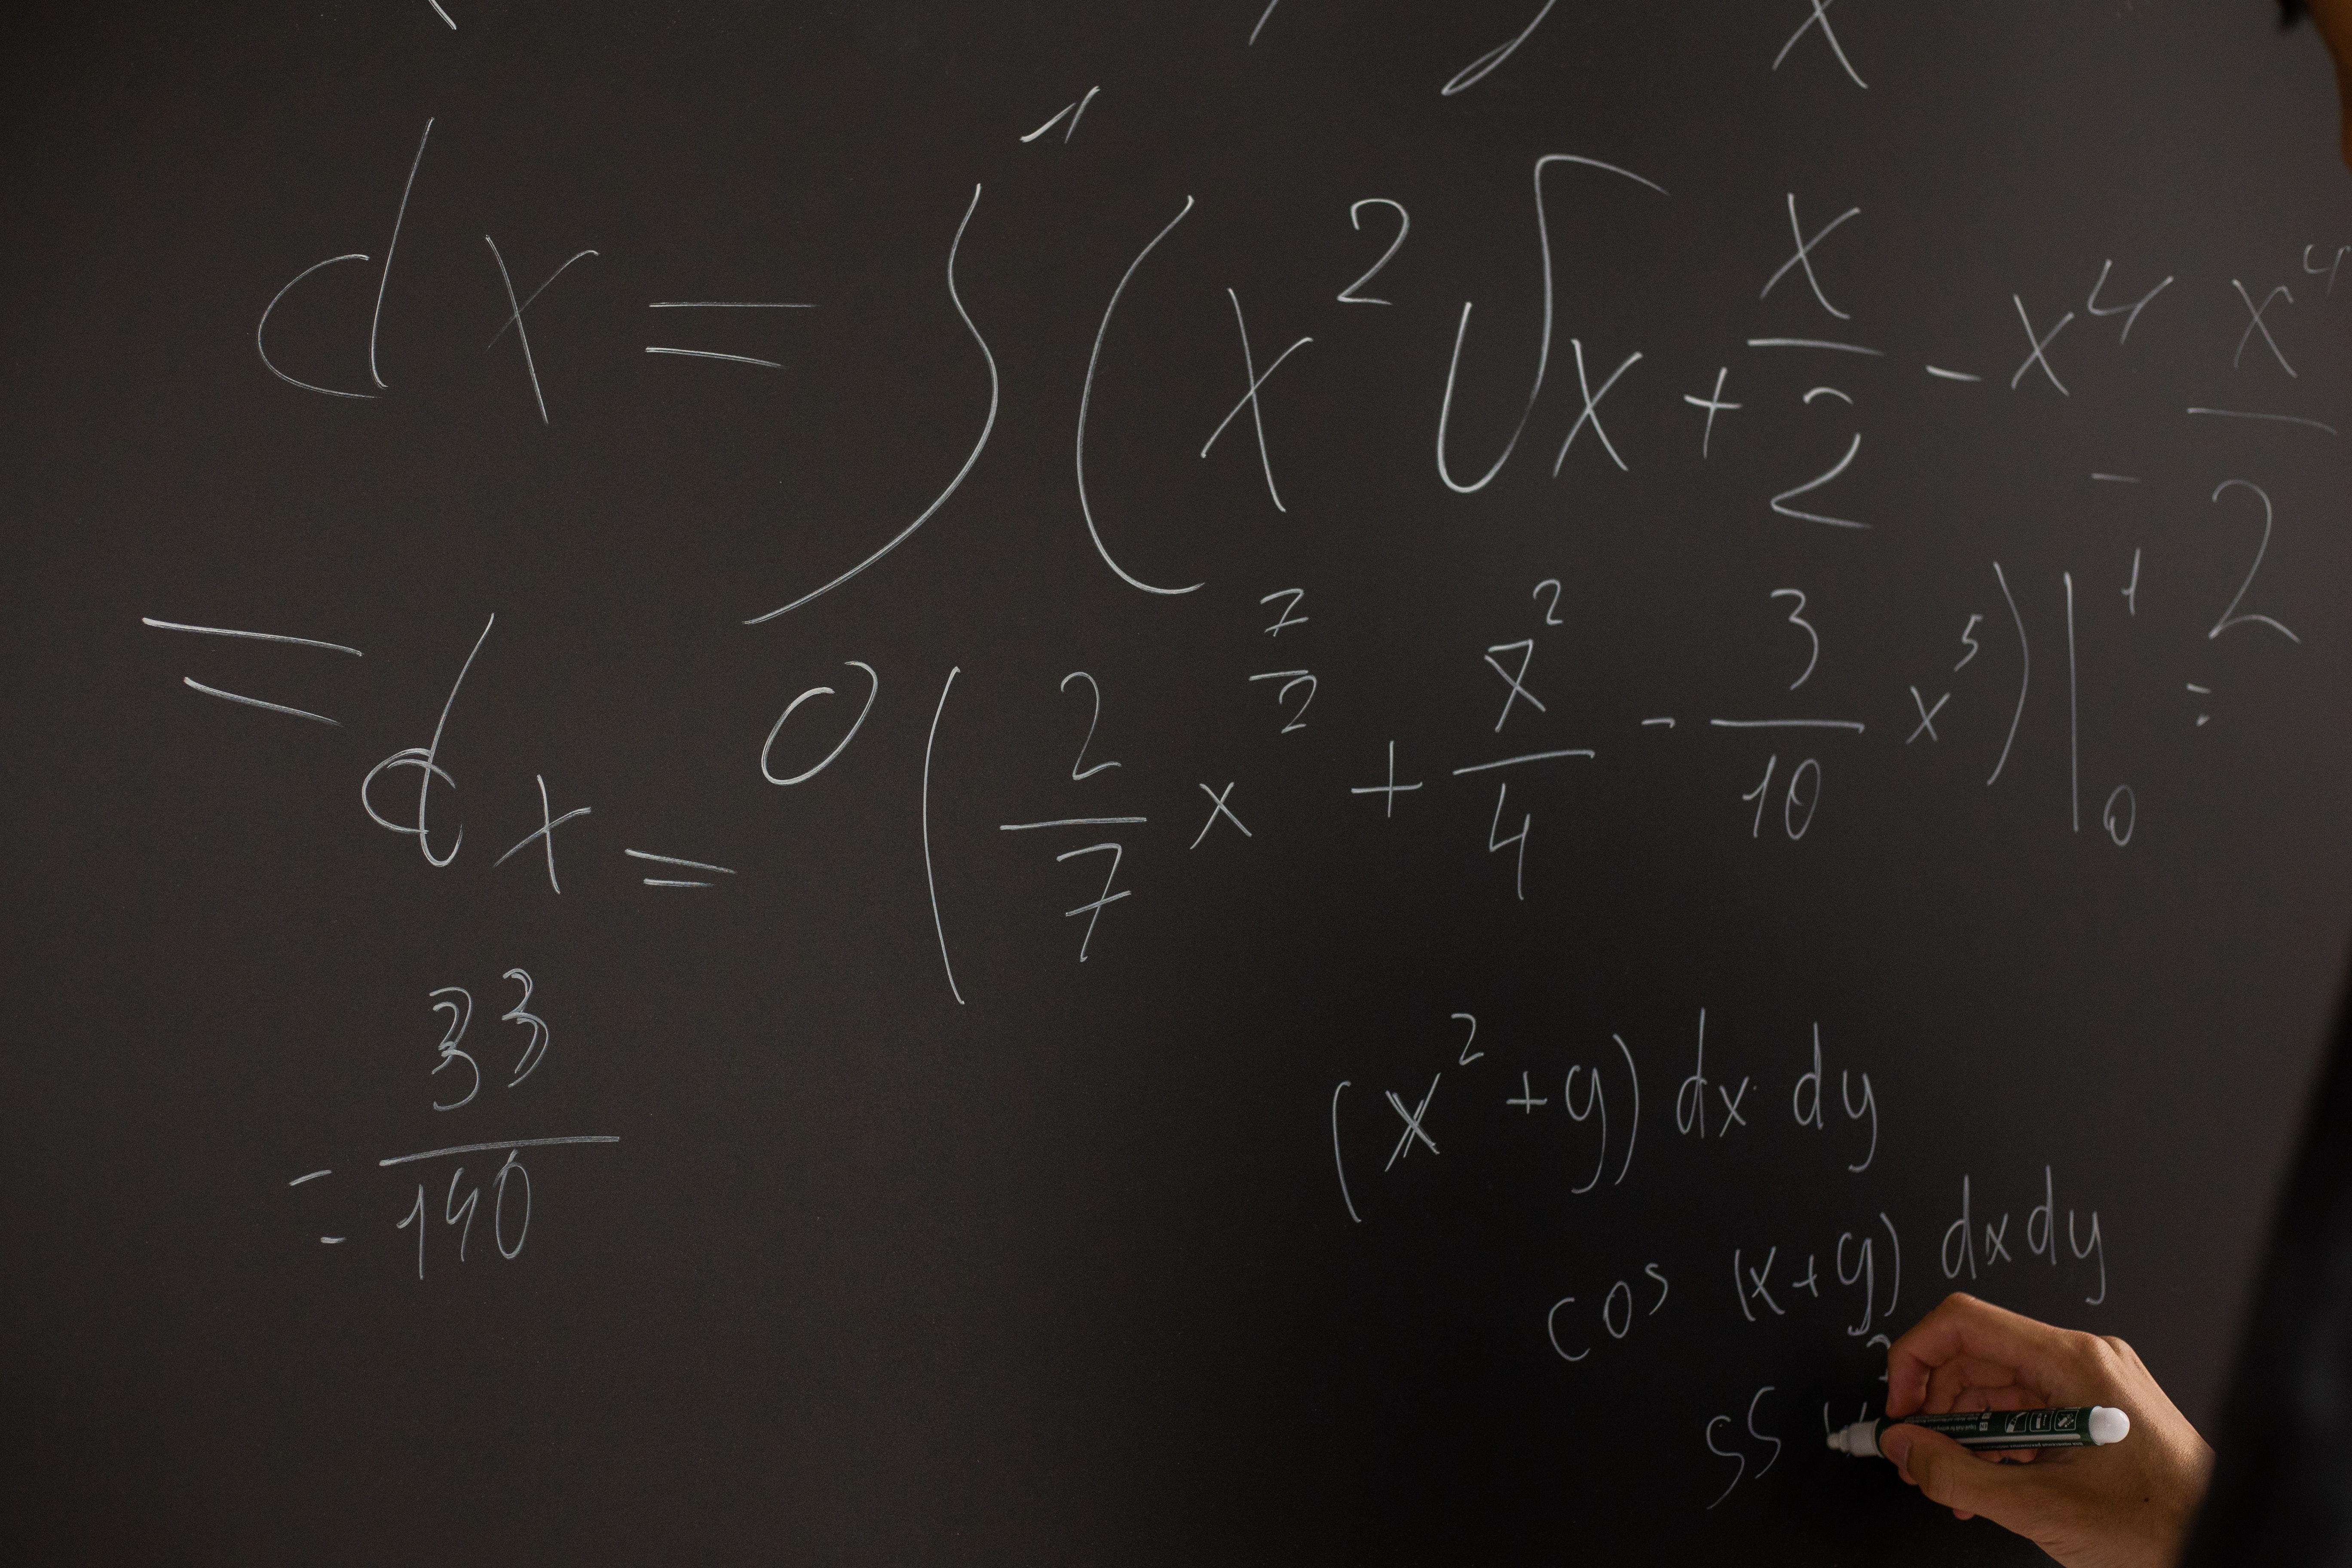 Equations Written On Blackboard · Free Stock Photo